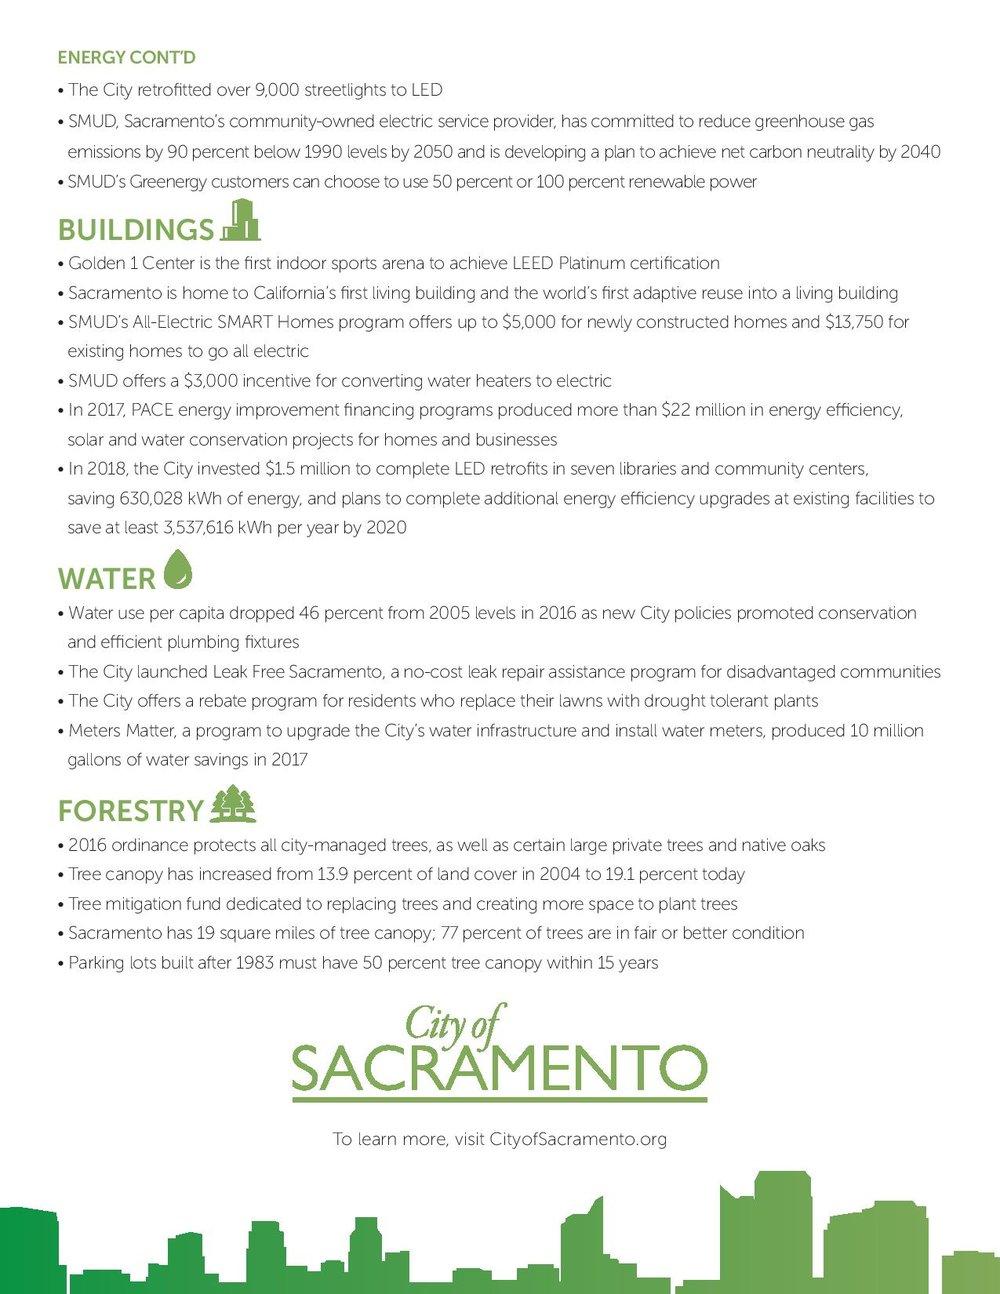 greencity-page-002.jpg